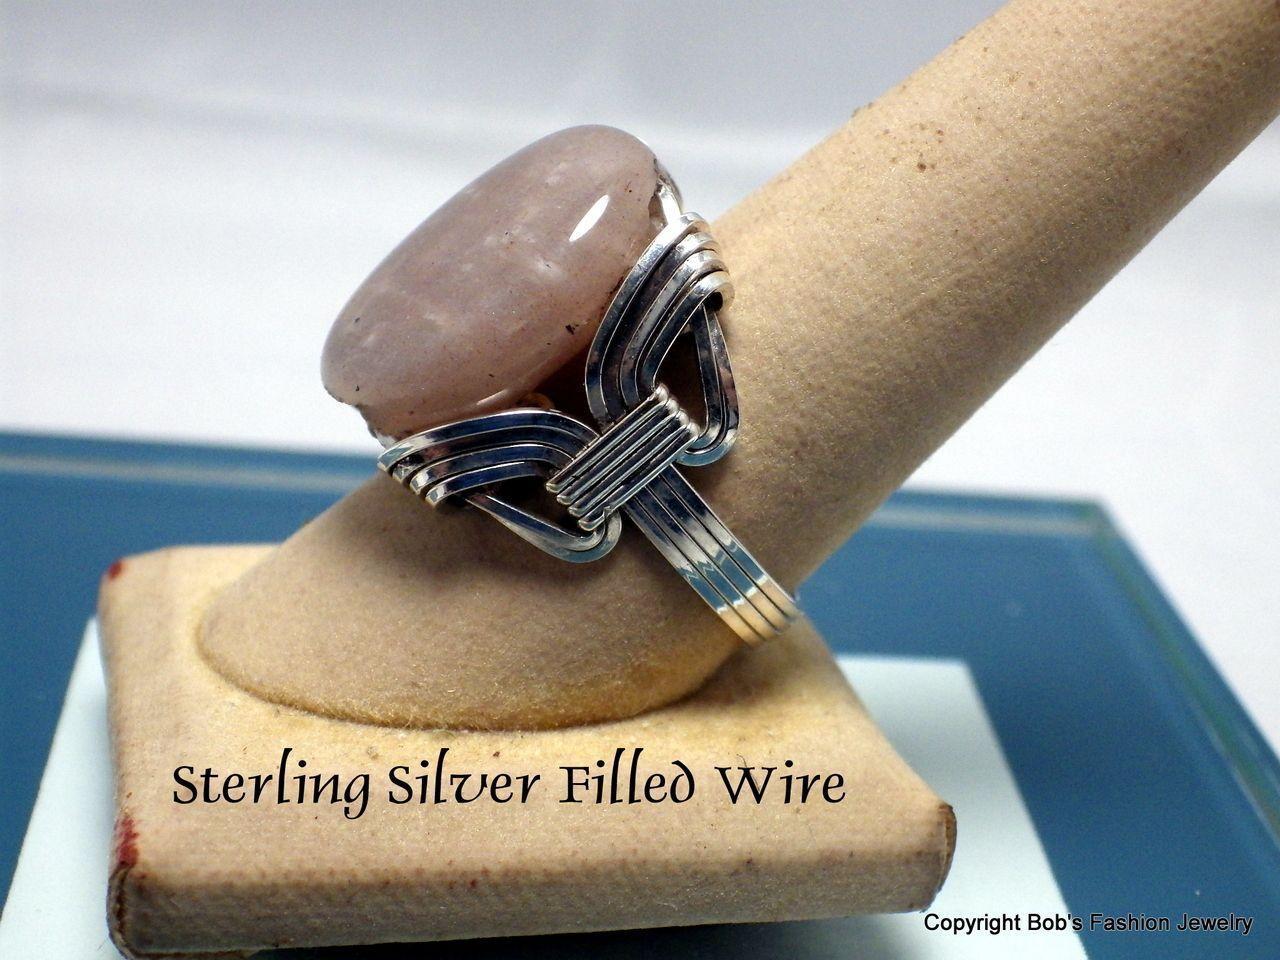 Jo-Bobs Fashion Jewelry - Moonstone Ring, $27.95 (http://www.jo-n-bobsfashionjewelry.com/moonstone-ring/)